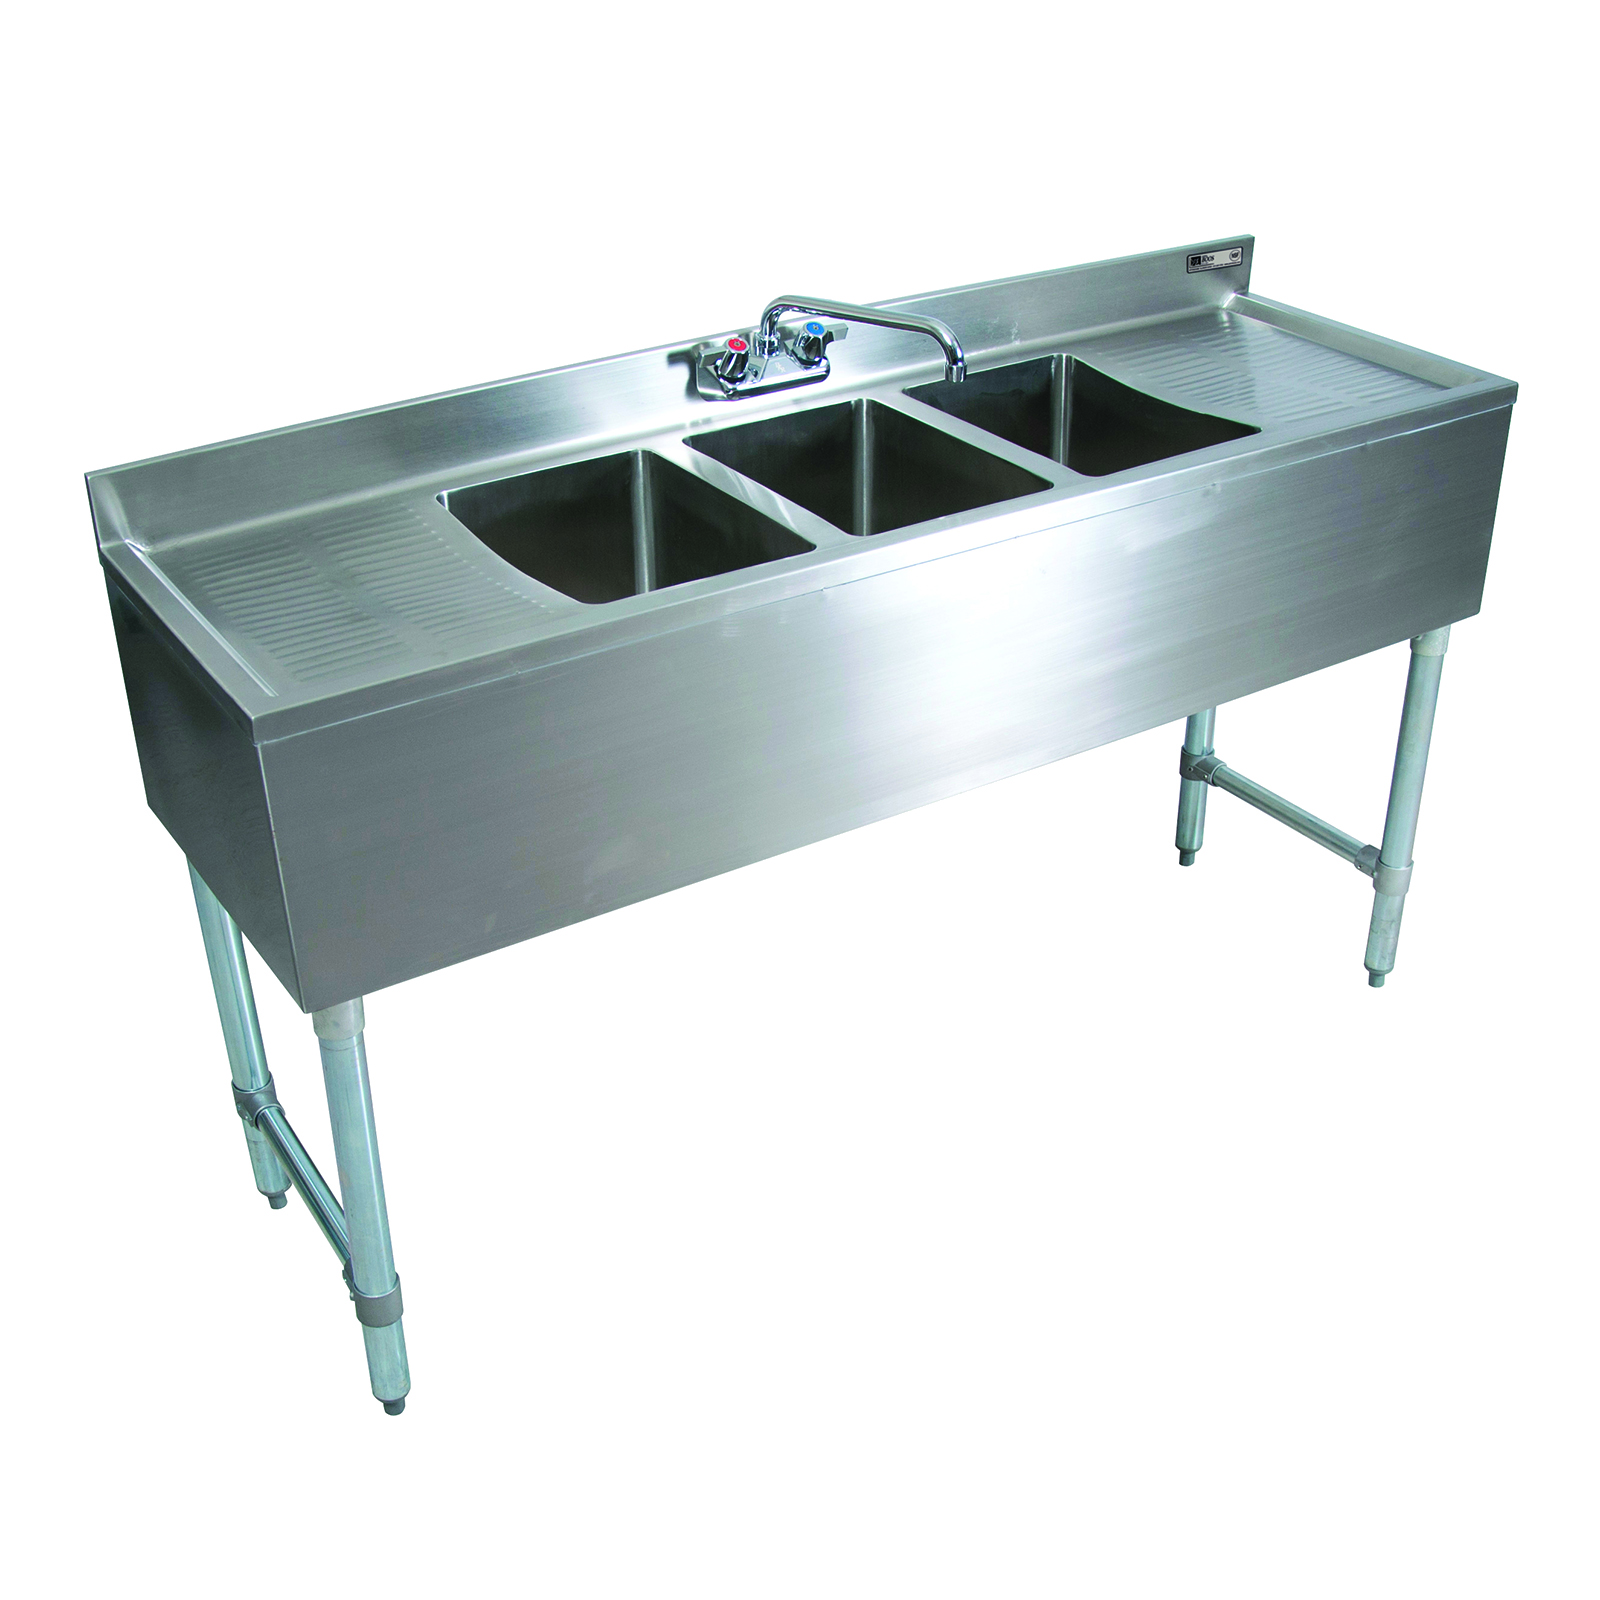 John Boos EUB3S48SL-1RD underbar sink units